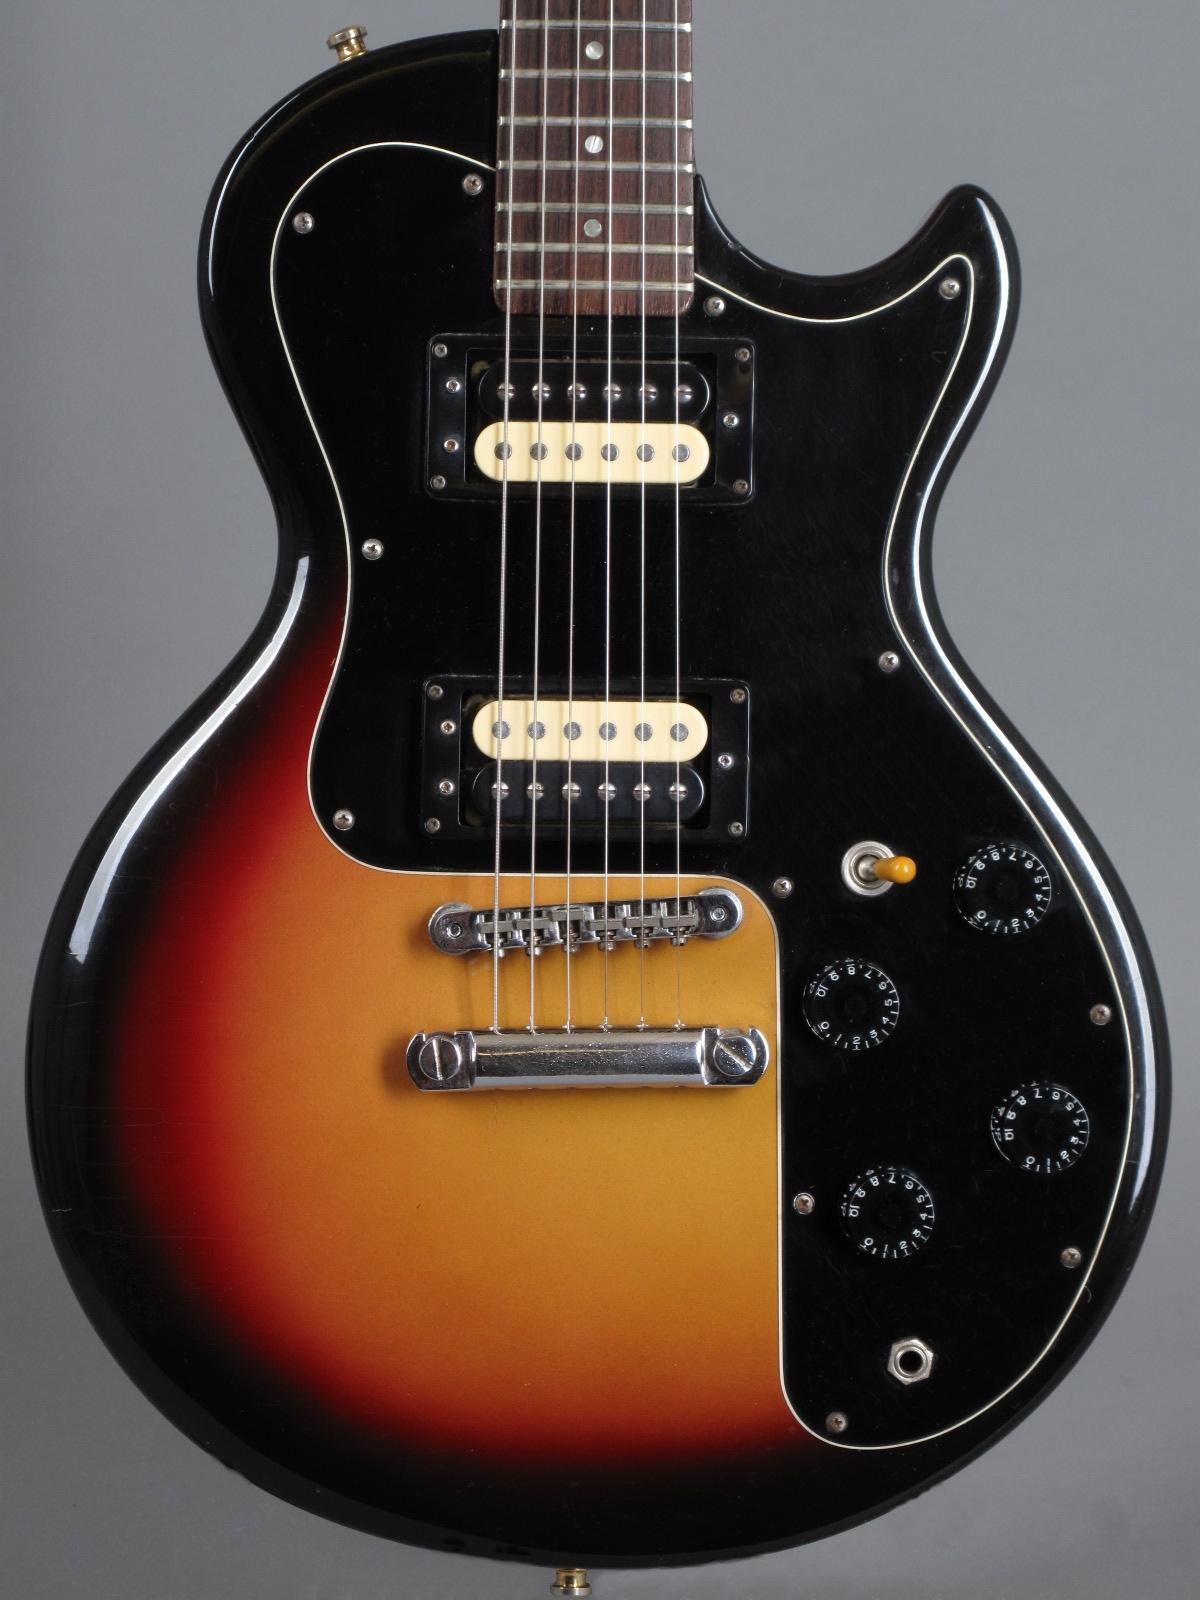 1982 Gibson Sonex 180 Deluxe - Sunburst